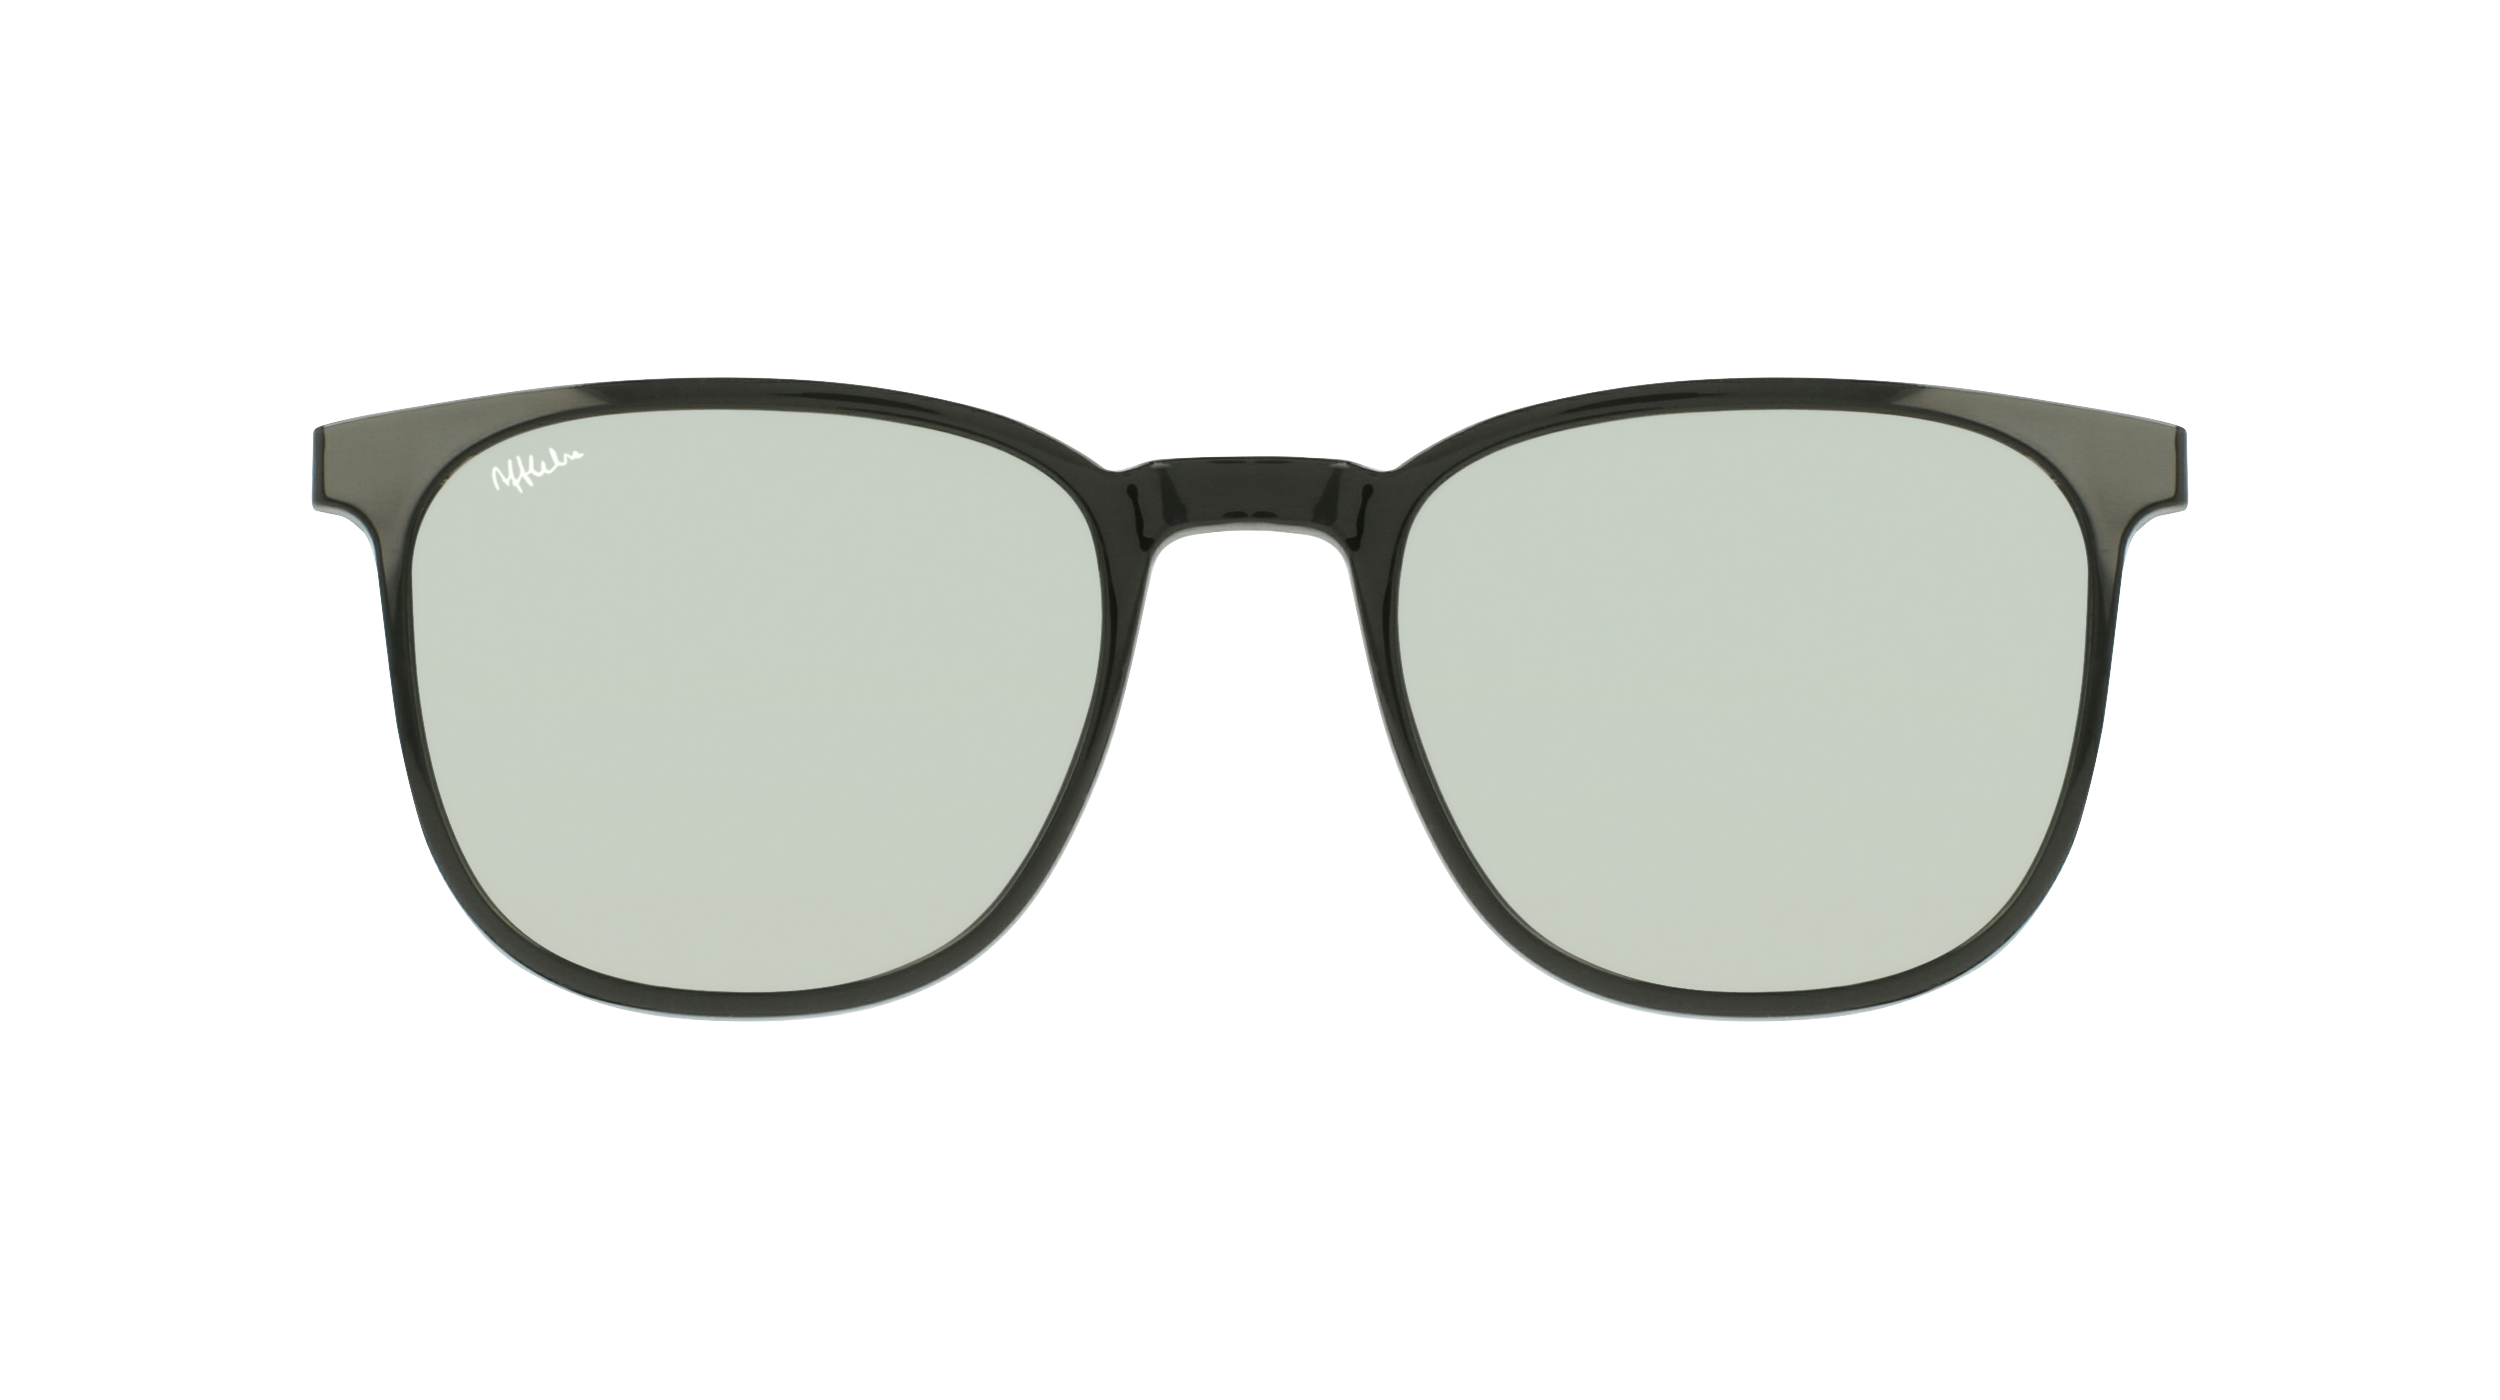 afflelou/france/products/smart_clip/clips_glasses/07630036457412.png